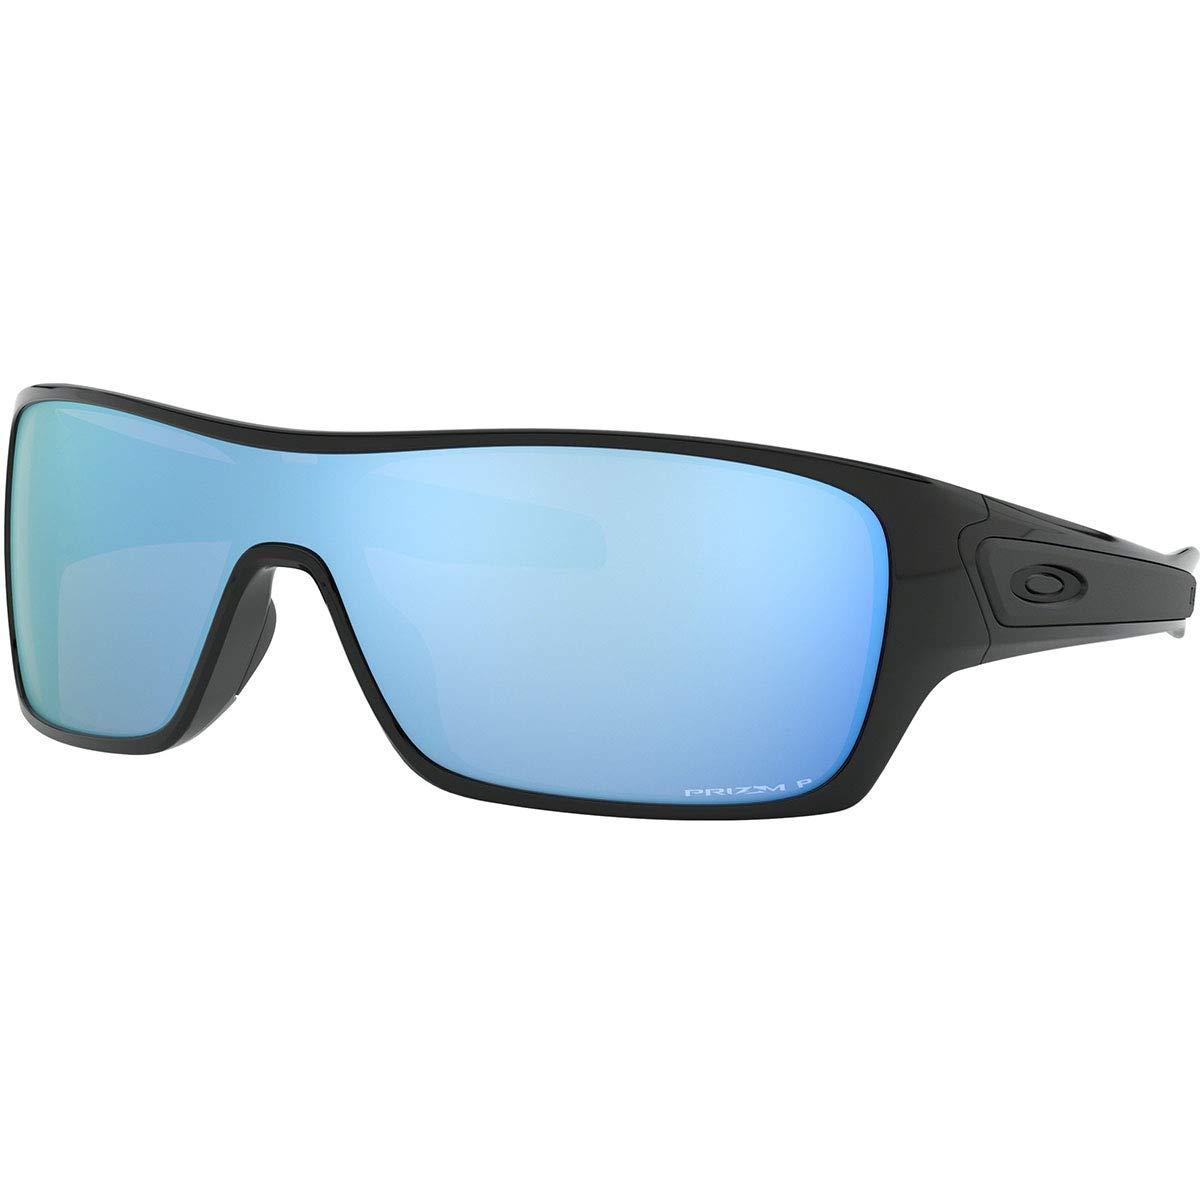 Oakley Men's OO9307 Turbine Rotor Rectangular Sunglasses, Polished Black/Prizm Deep H2O Polarized, 32 mm by Oakley